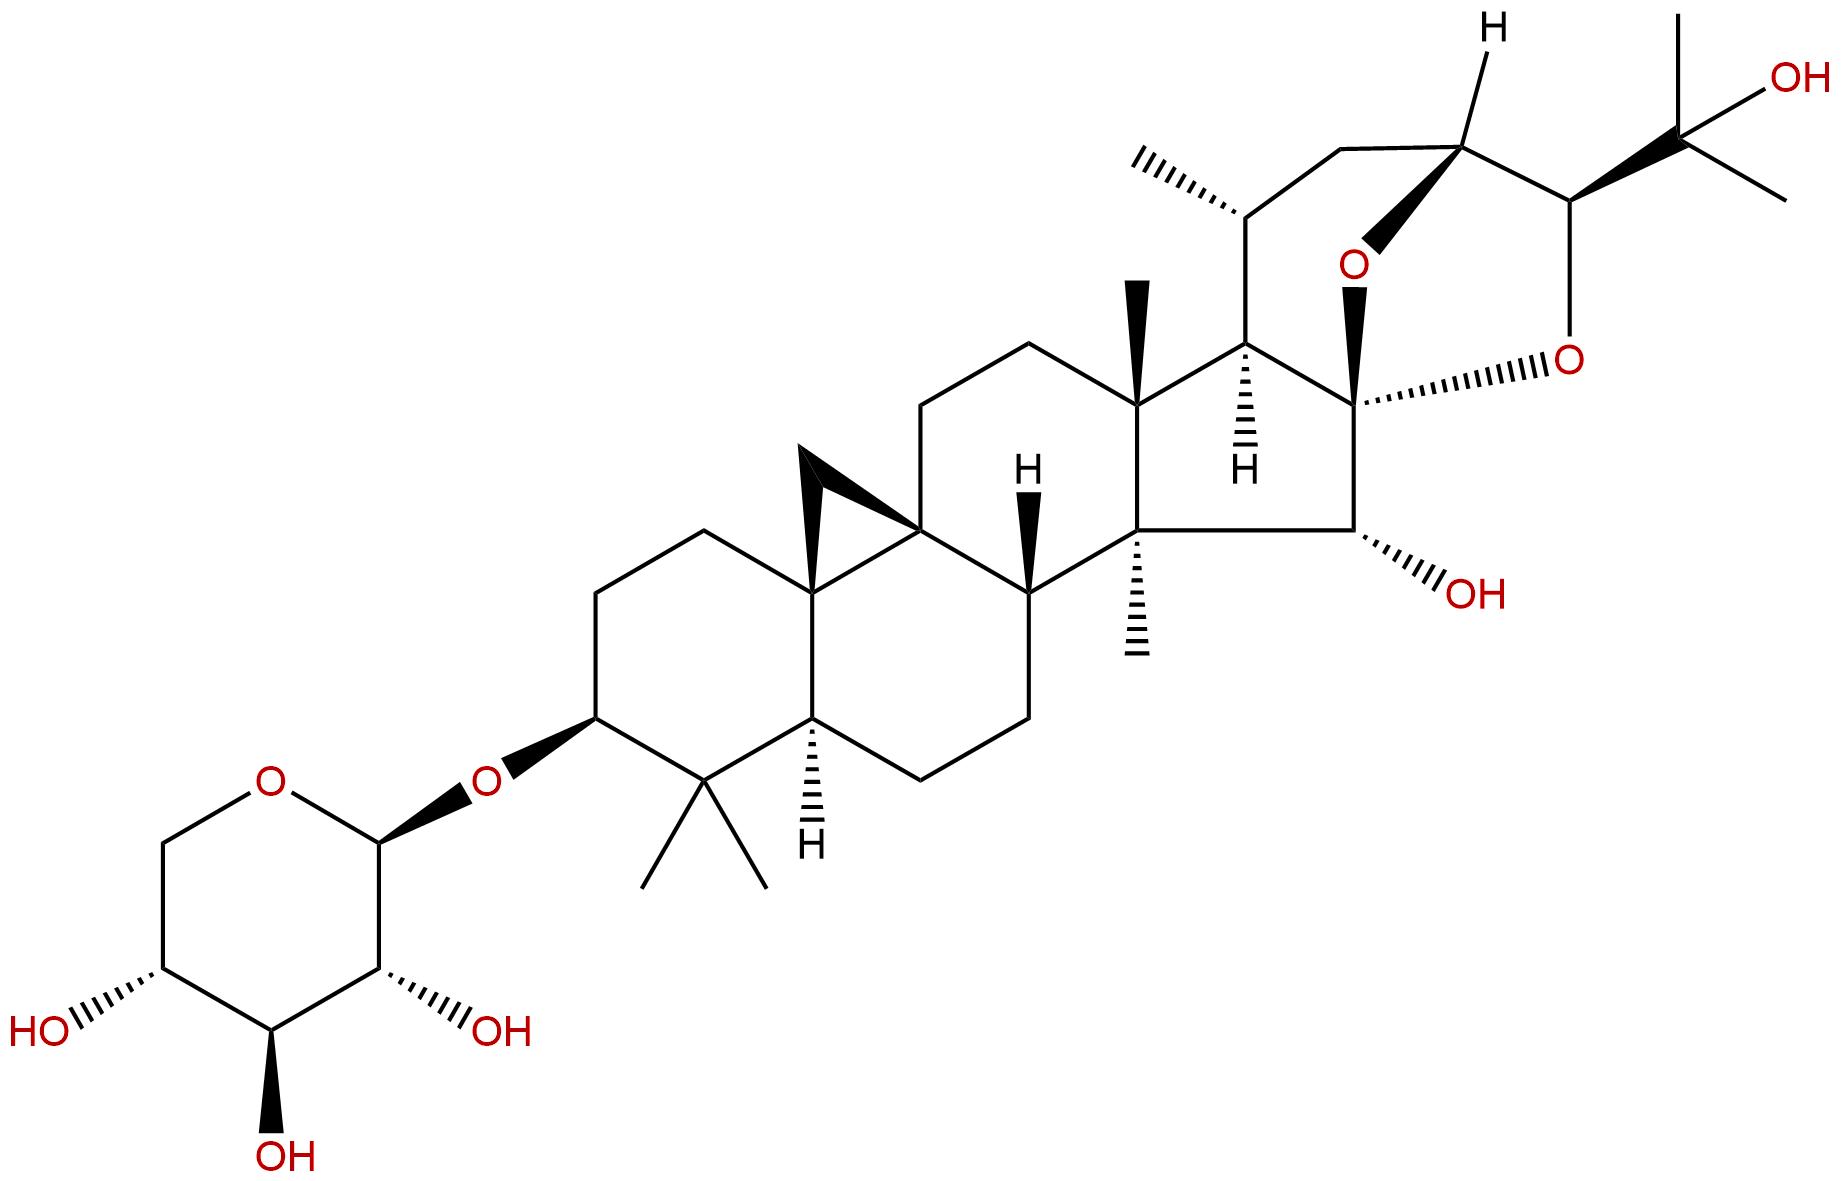 CiMigenol 3-beta-D-xylopyranoside